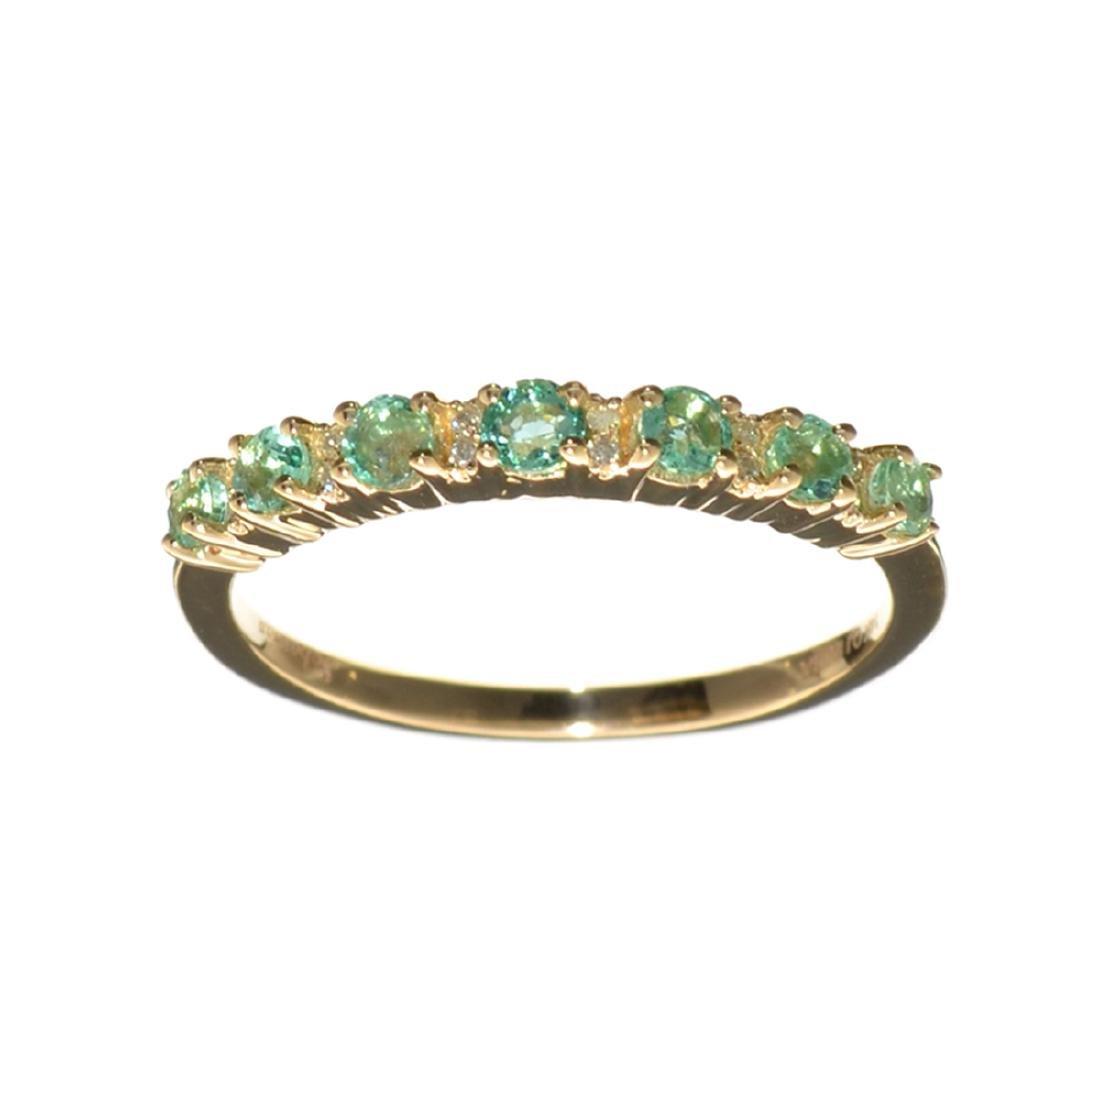 Designer Sebastian 14KT Gold 0.59CT Emerald and 0.04CT